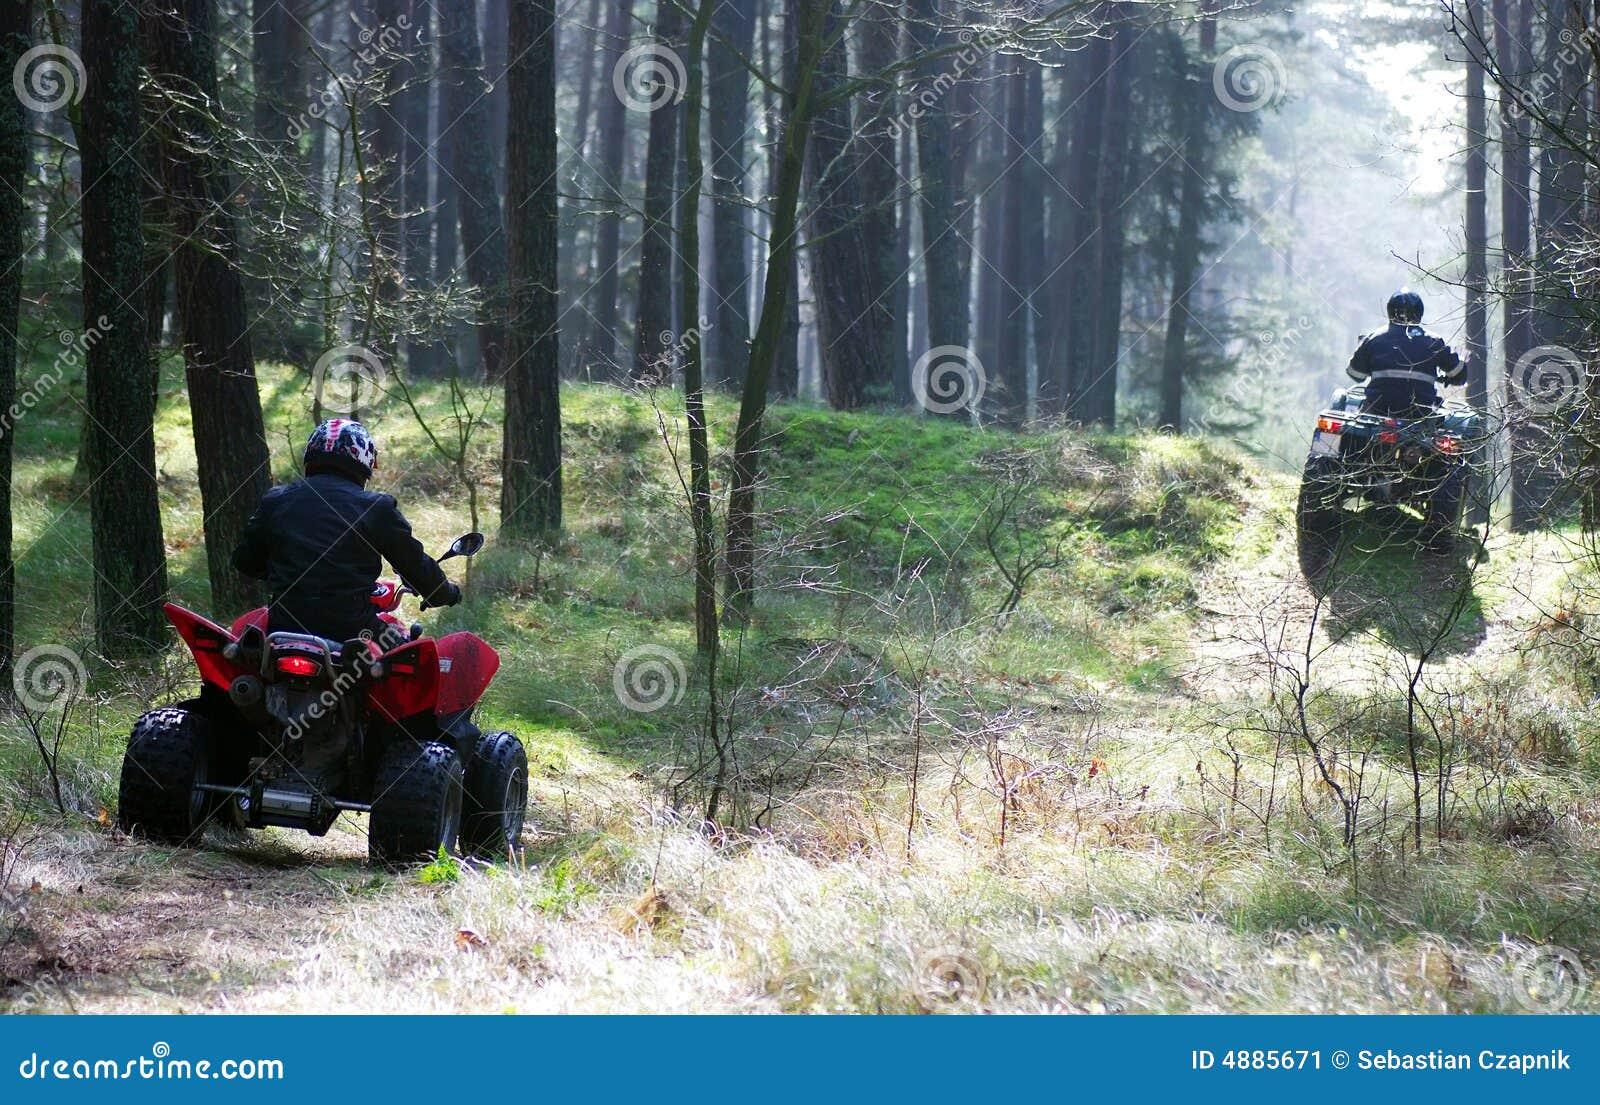 Twee vierlingen in bos